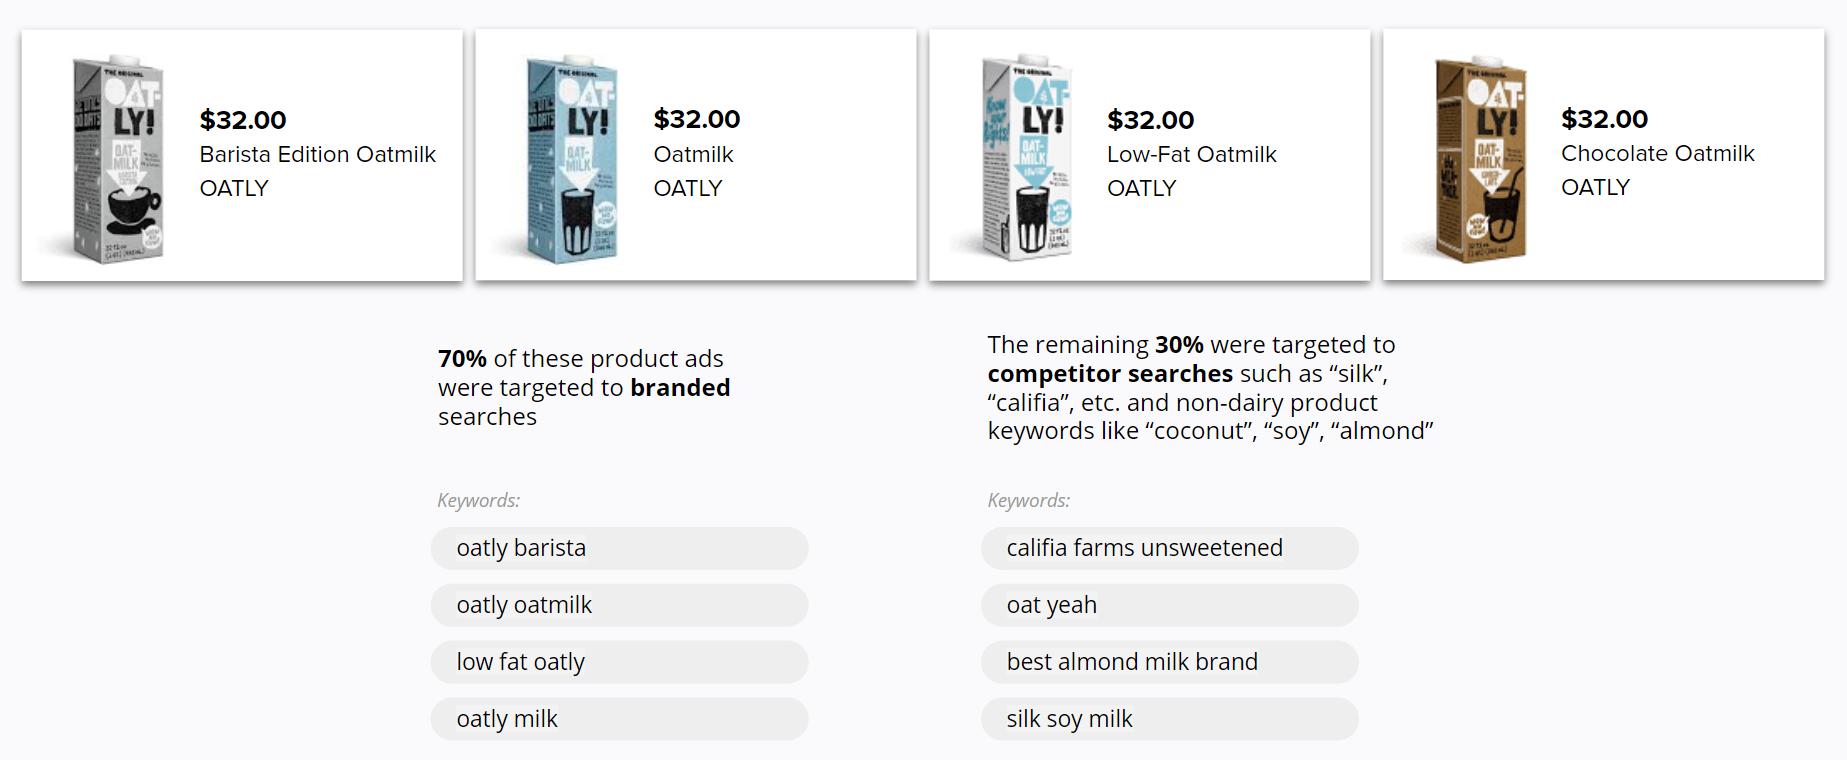 Oatly - Product Ads